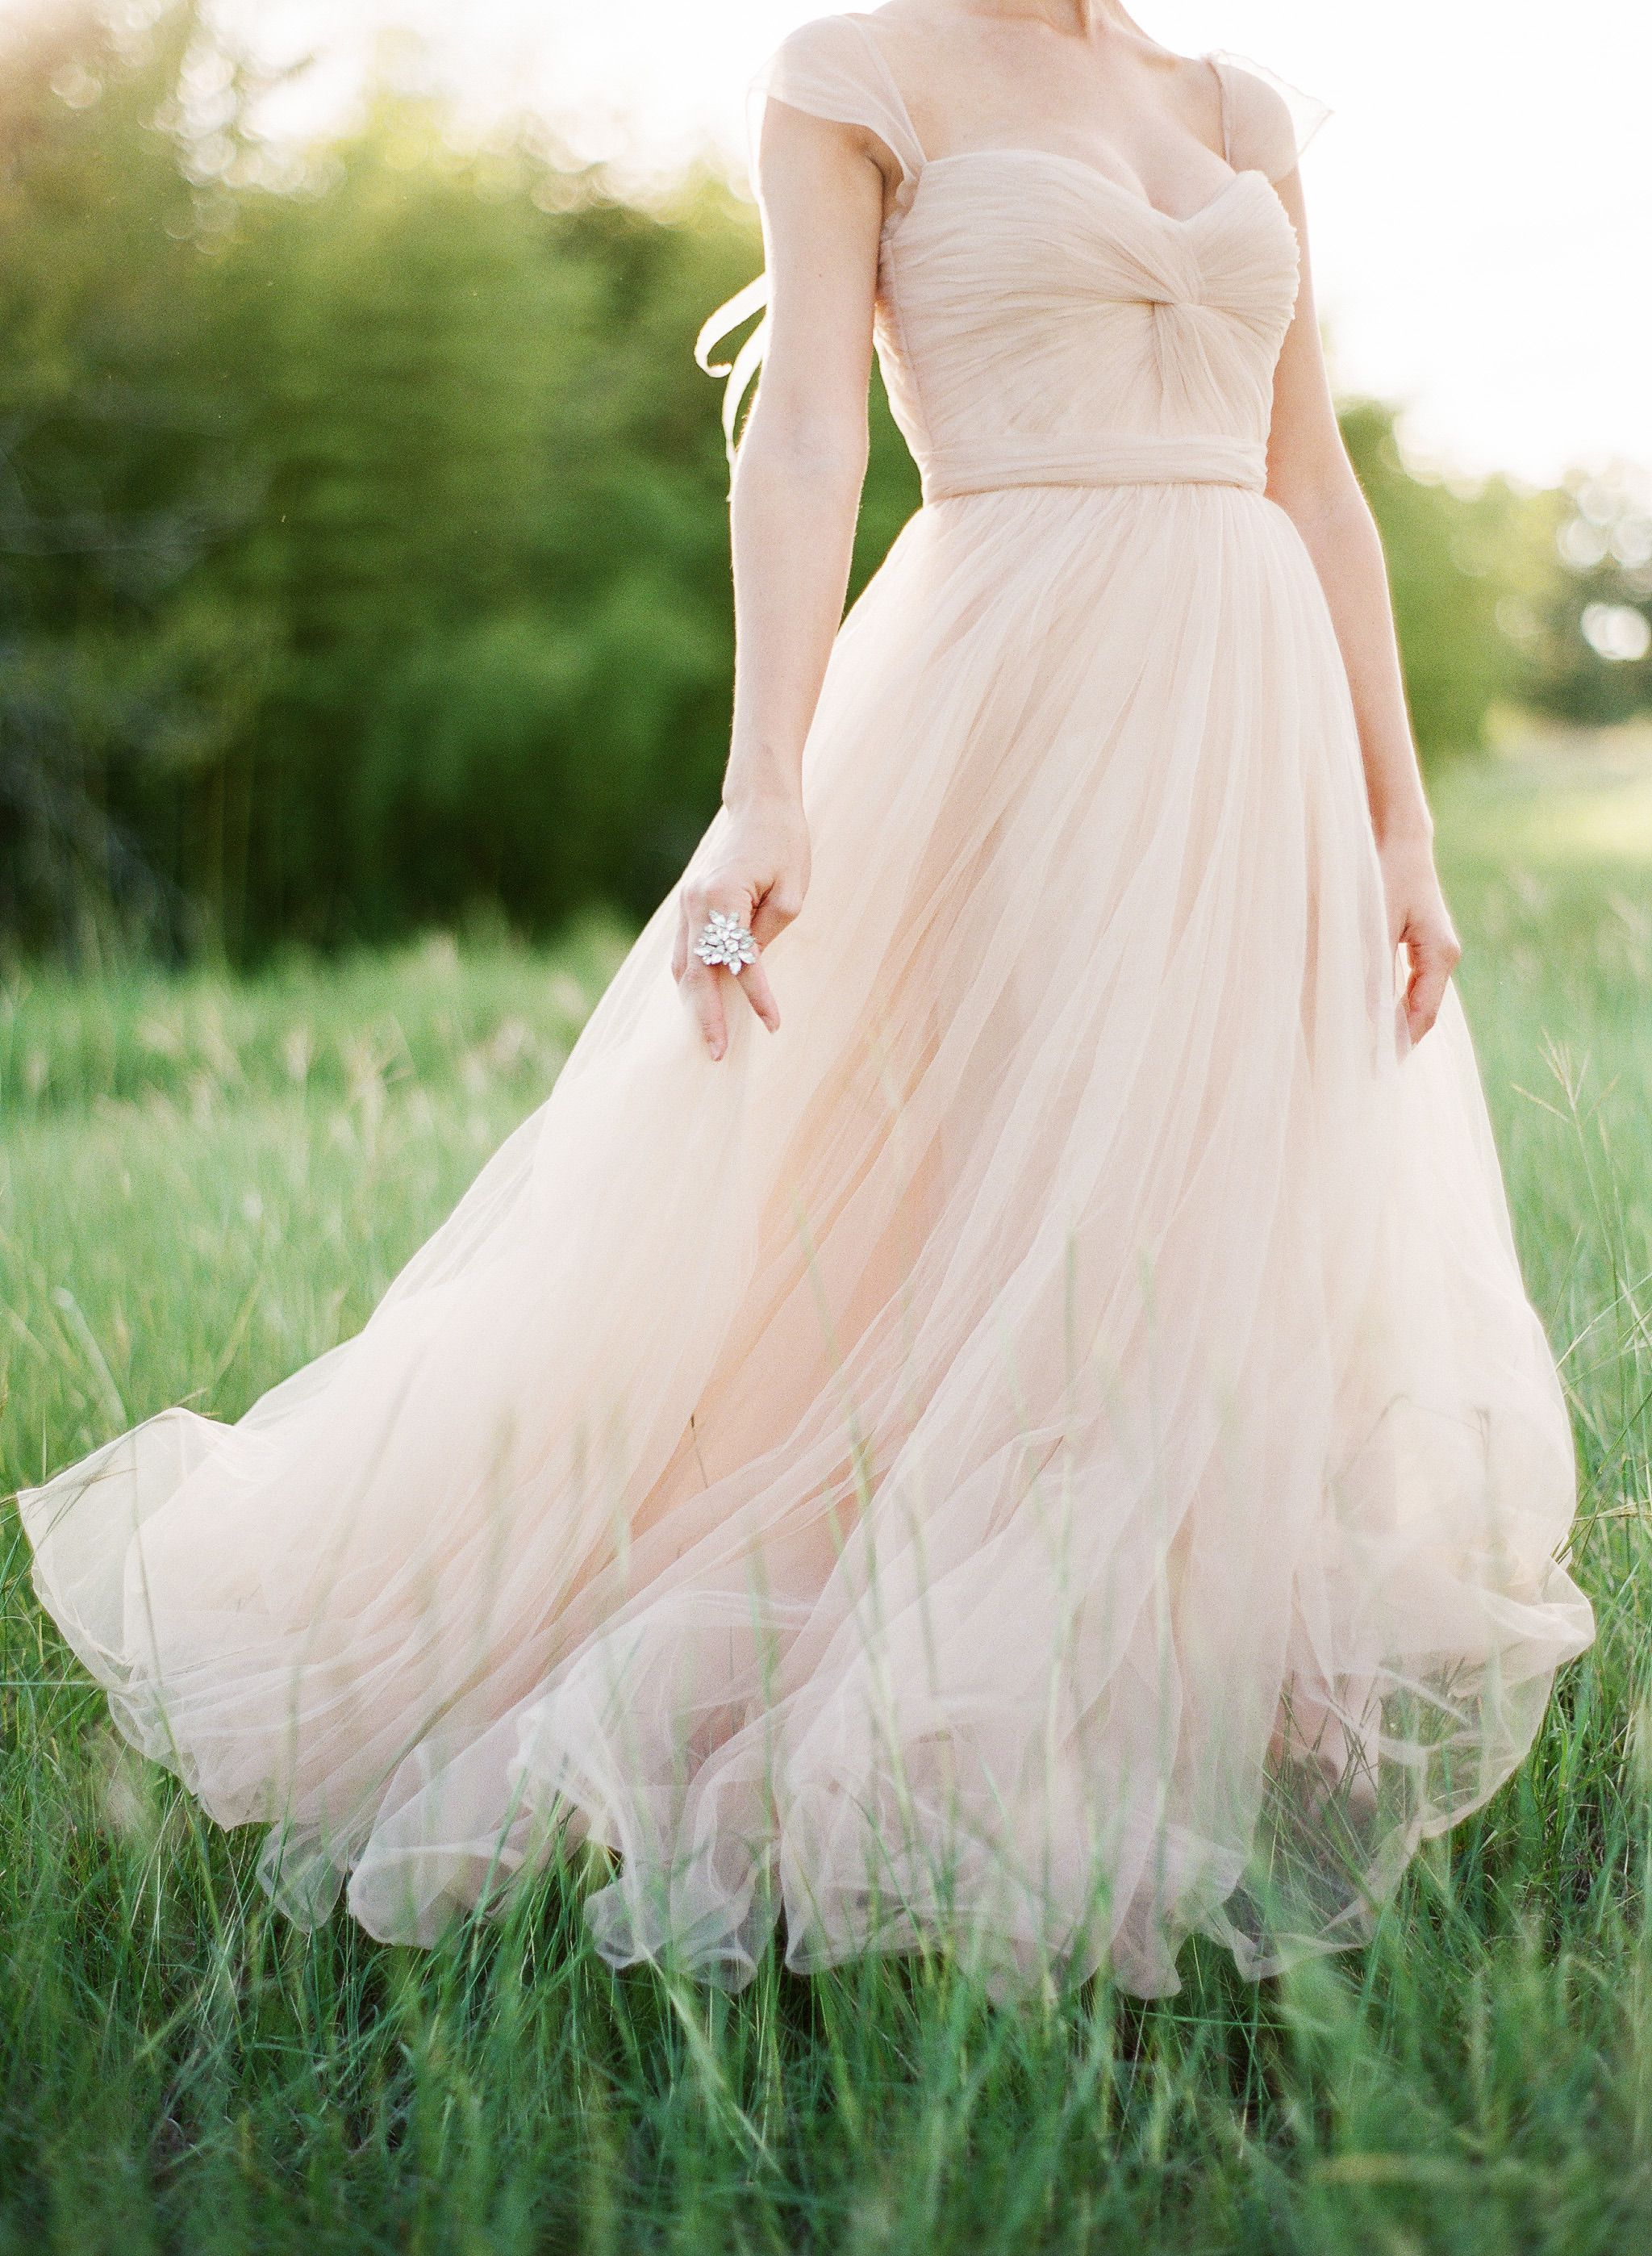 Red, Blush + Gold Wedding Inspiration | Reem acra wedding dress, Red ...